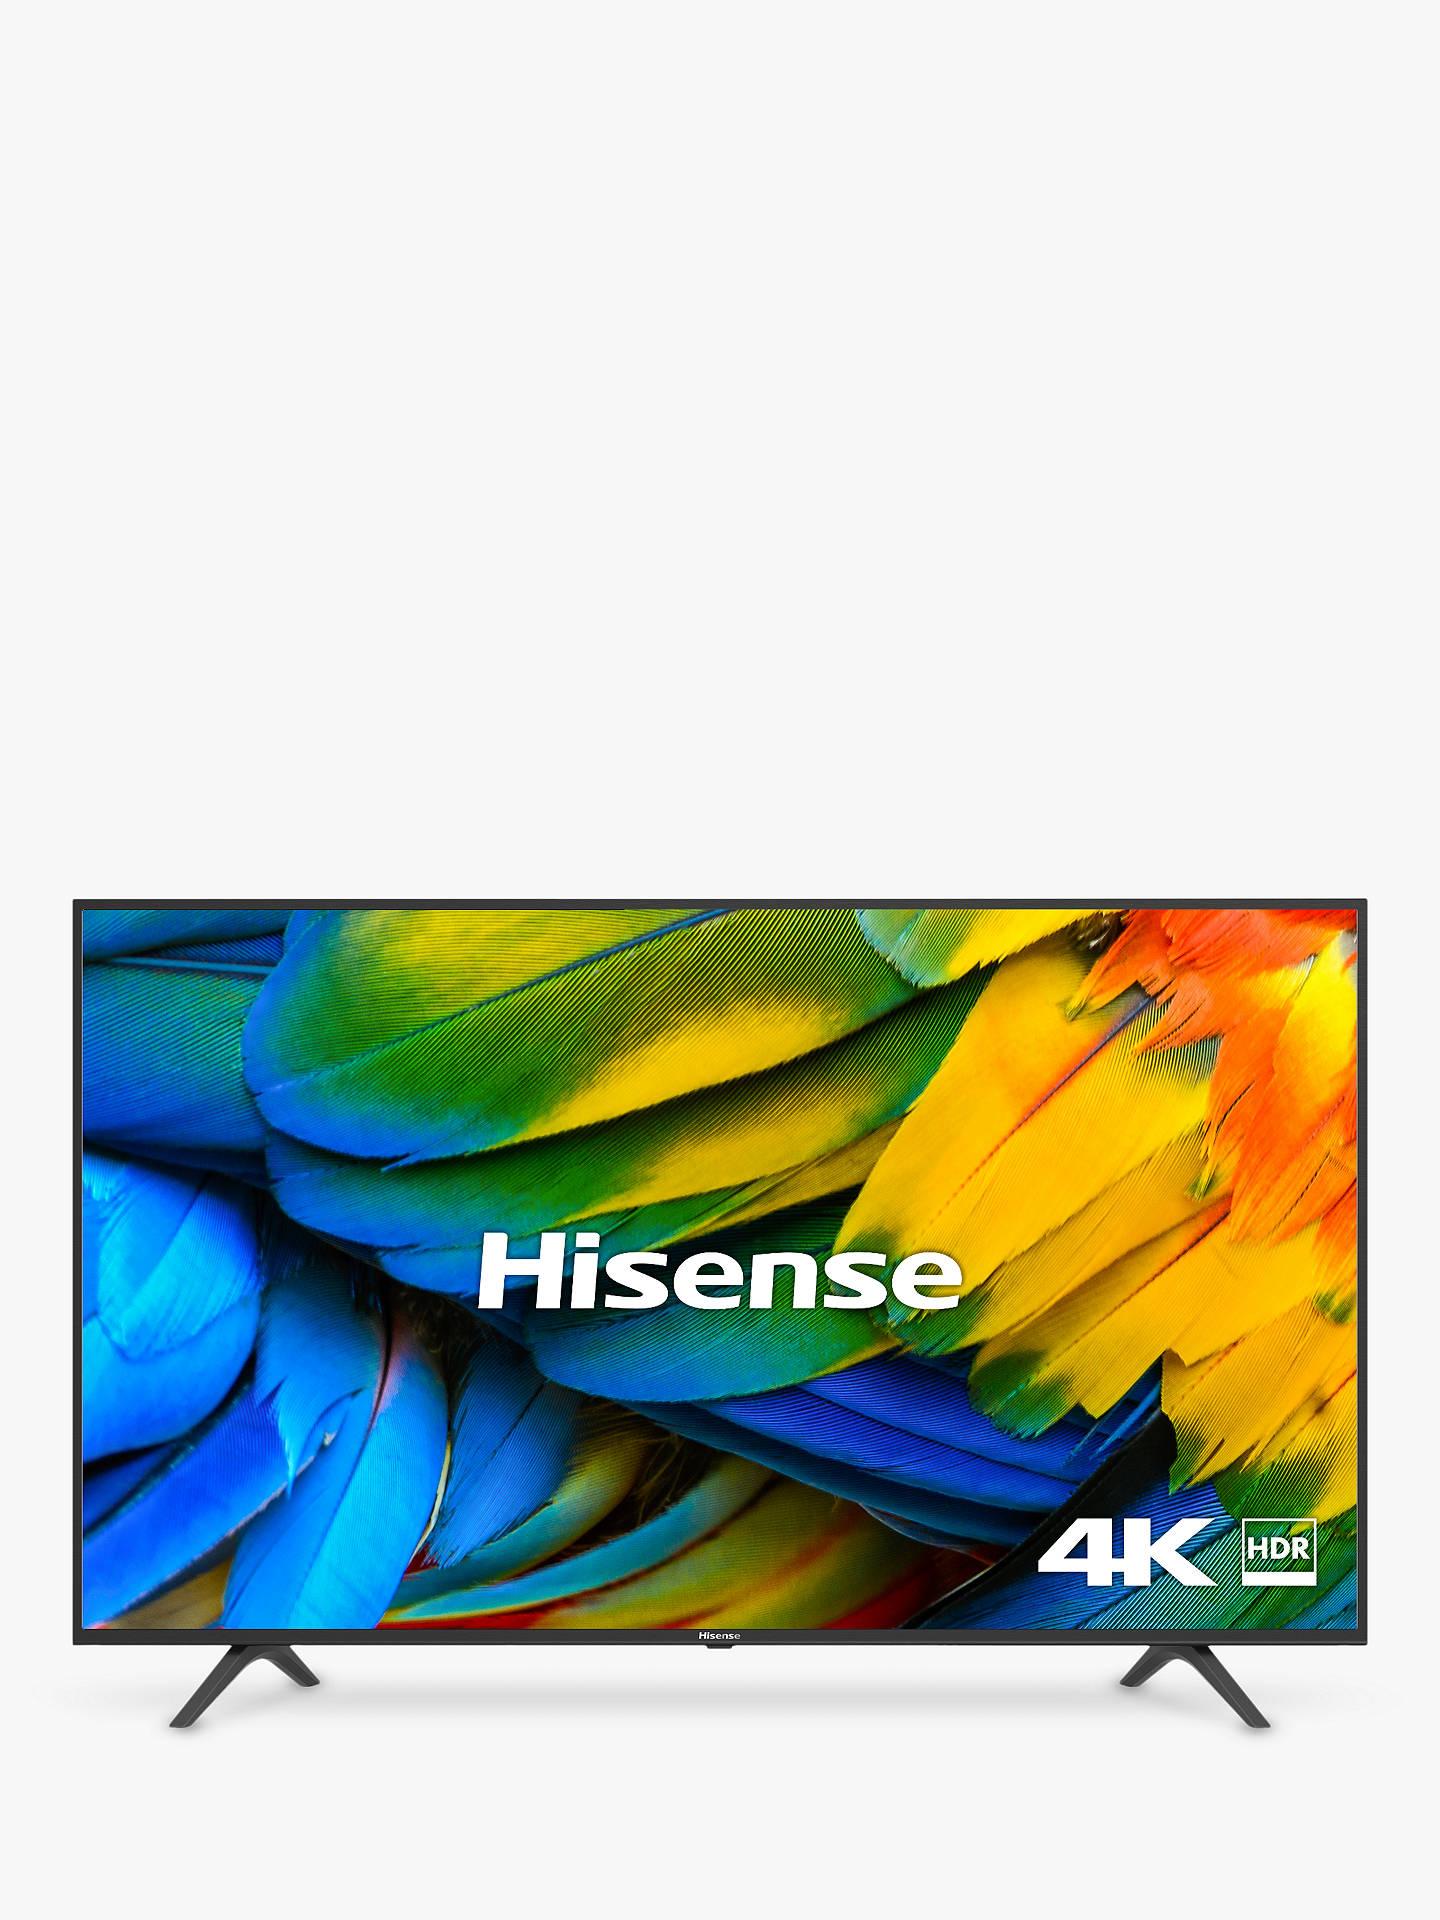 "Hisense H43B7100UK (2019) LED HDR 4K Ultra HD Smart TV, 43"" with Freeview Play, Black/Silver+ 5 year guarantee £249 @ John Lewis & Partners"